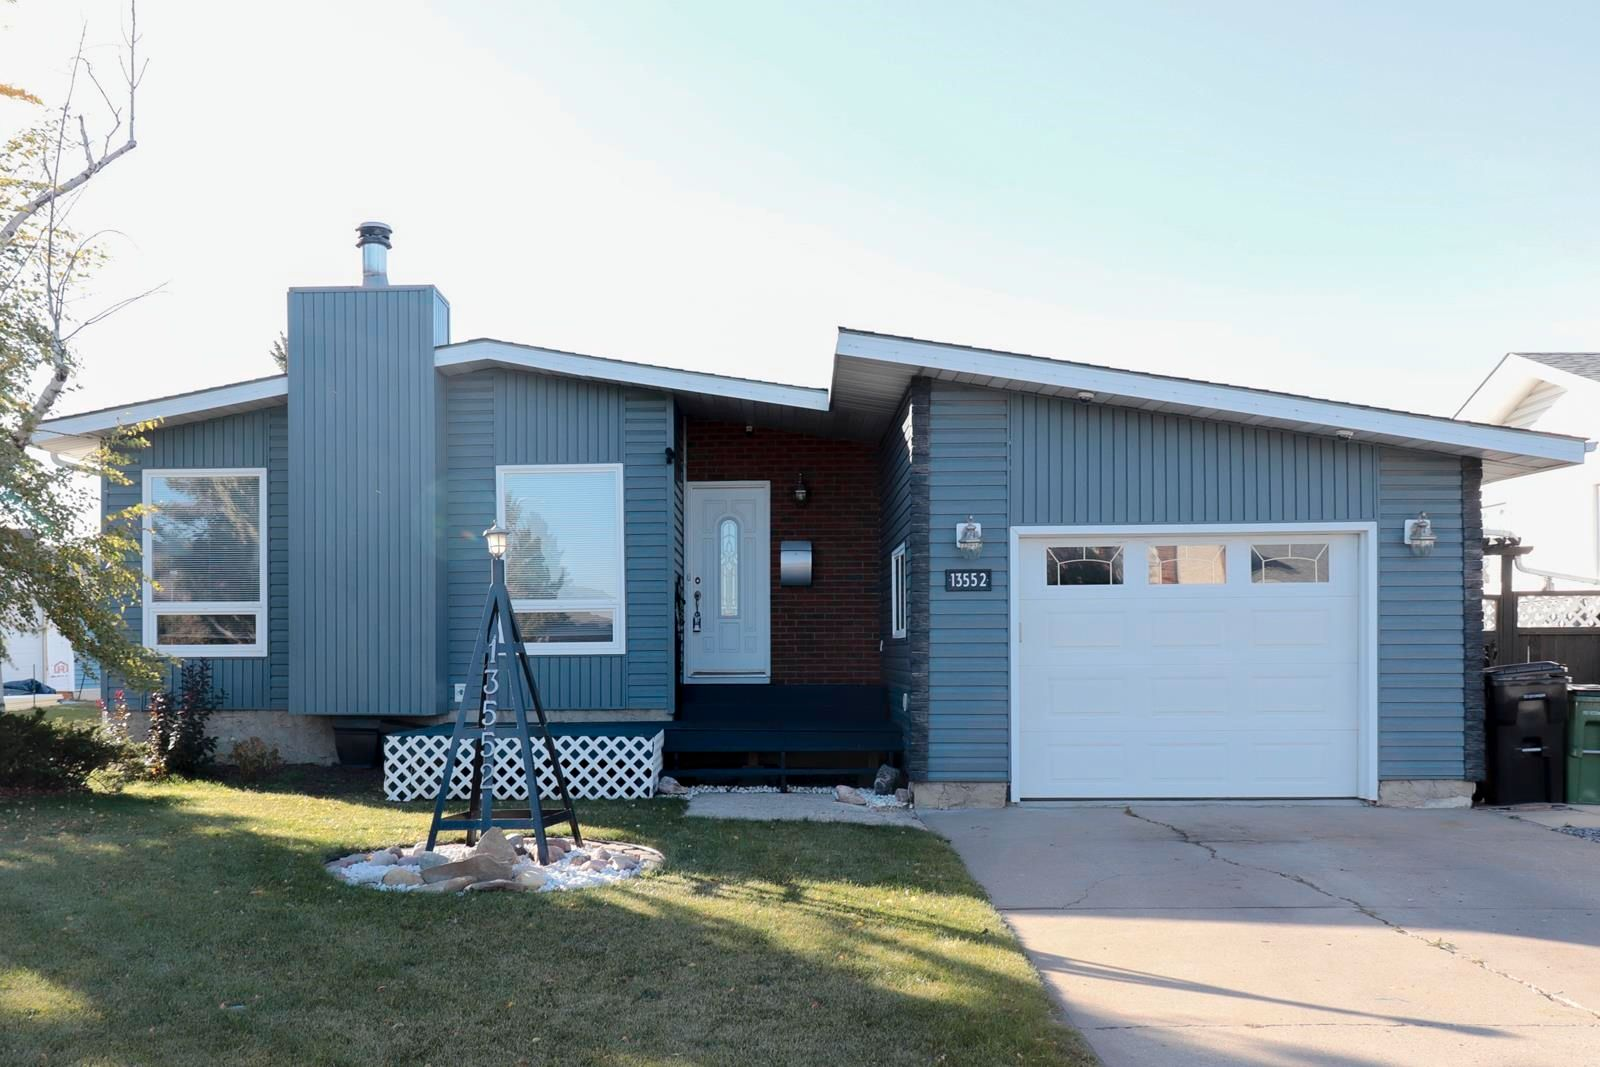 Main Photo: 13552 25 Street in Edmonton: Zone 35 House for sale : MLS®# E4266497